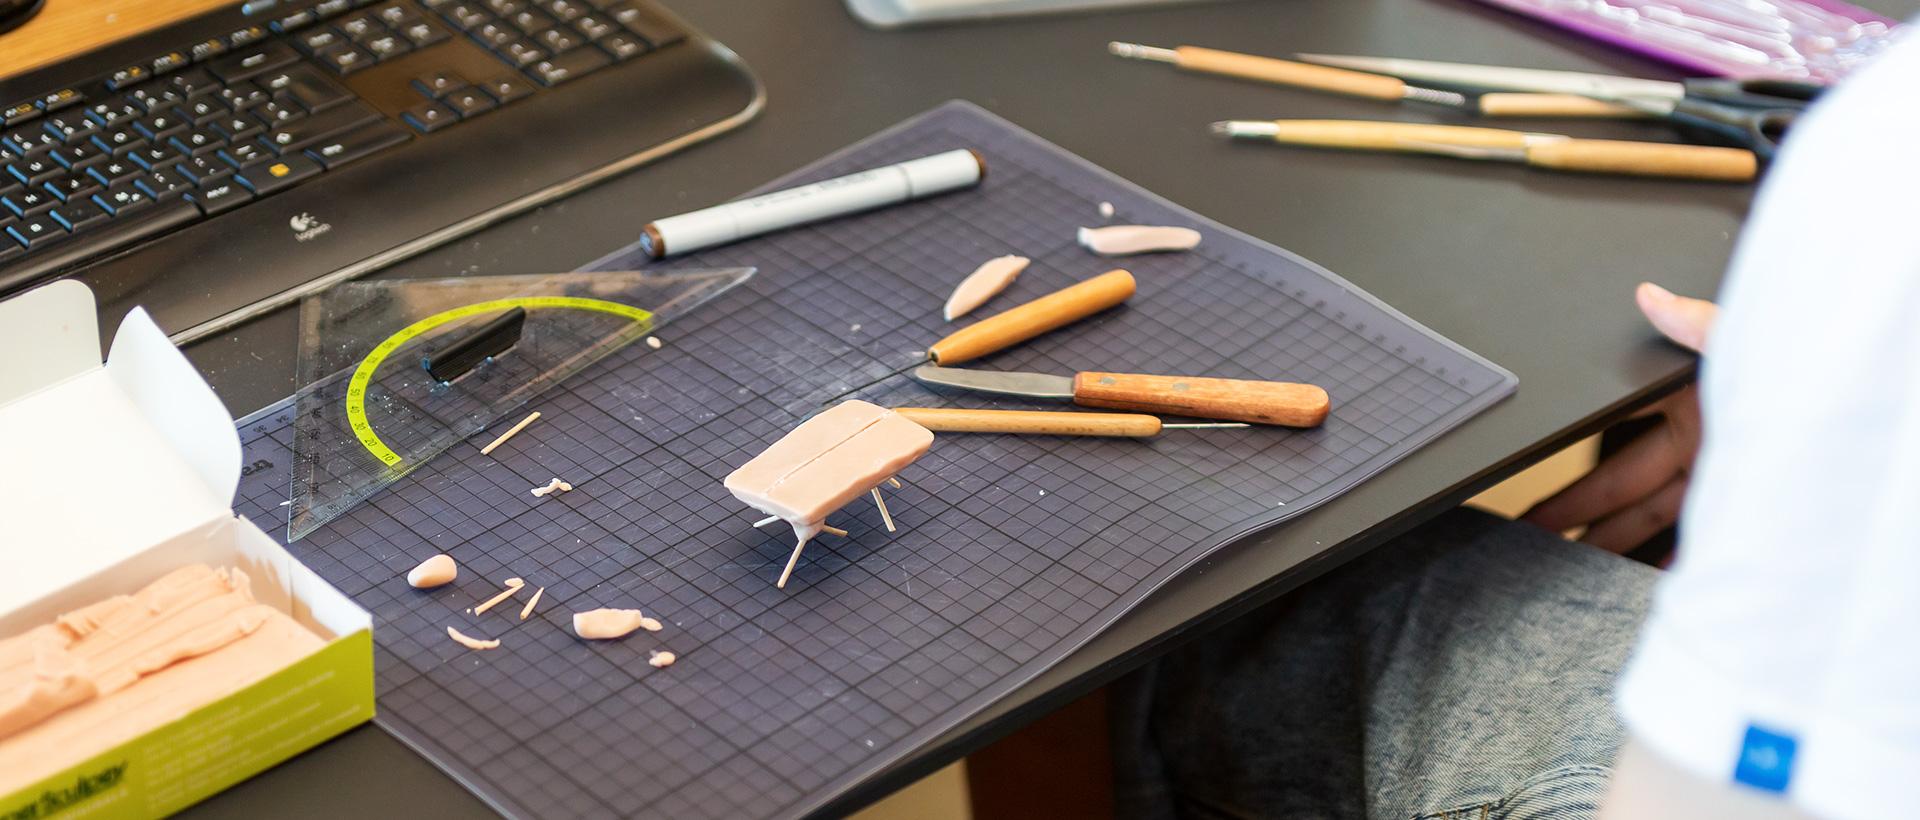 Praktikum im Produktdesign bei Wimmer Wohnkollektionen - Modellbau